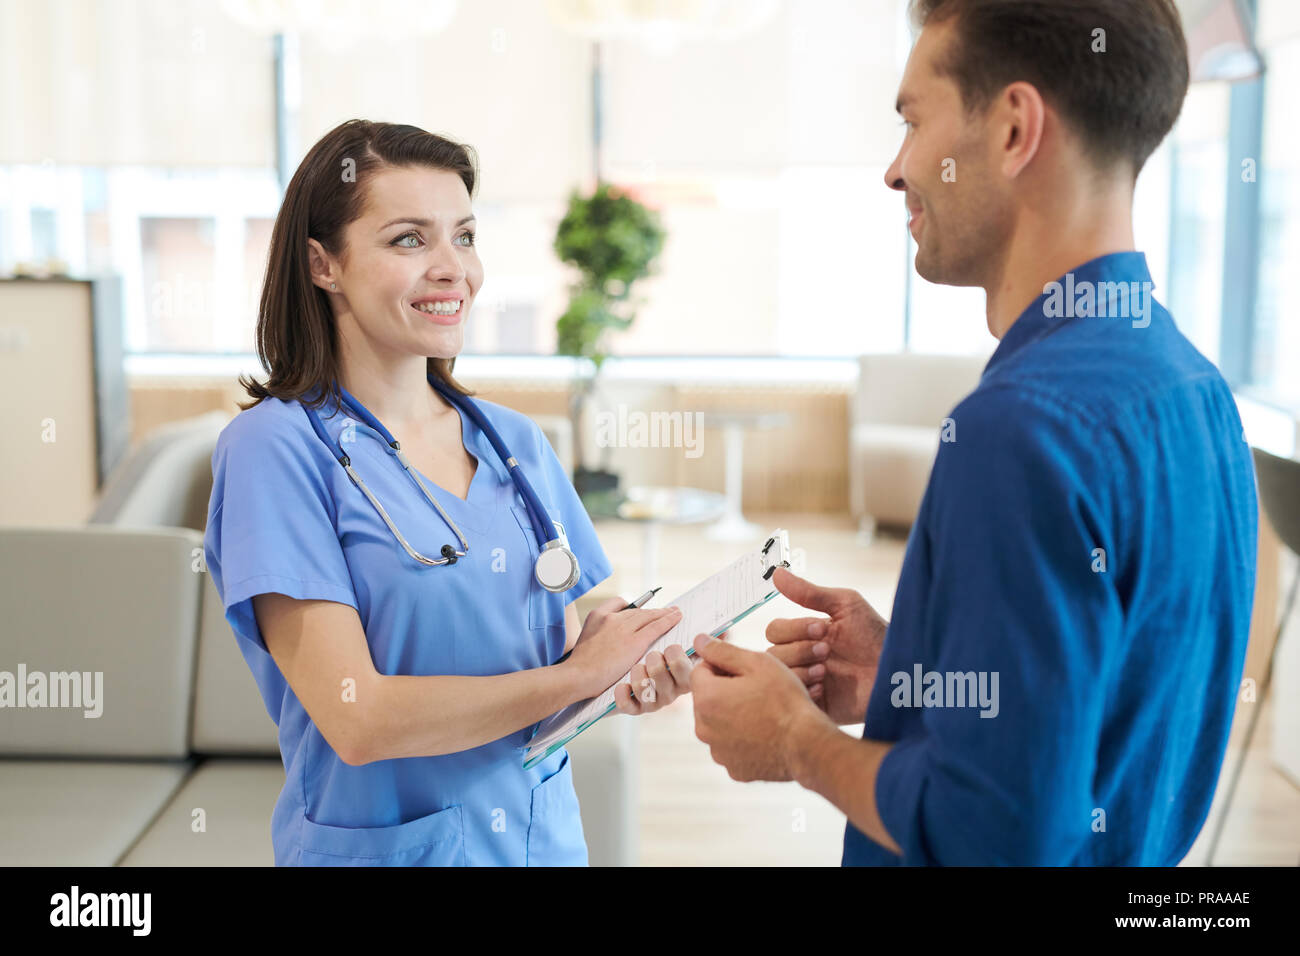 Smiling Nurse Talking to Patient - Stock Image